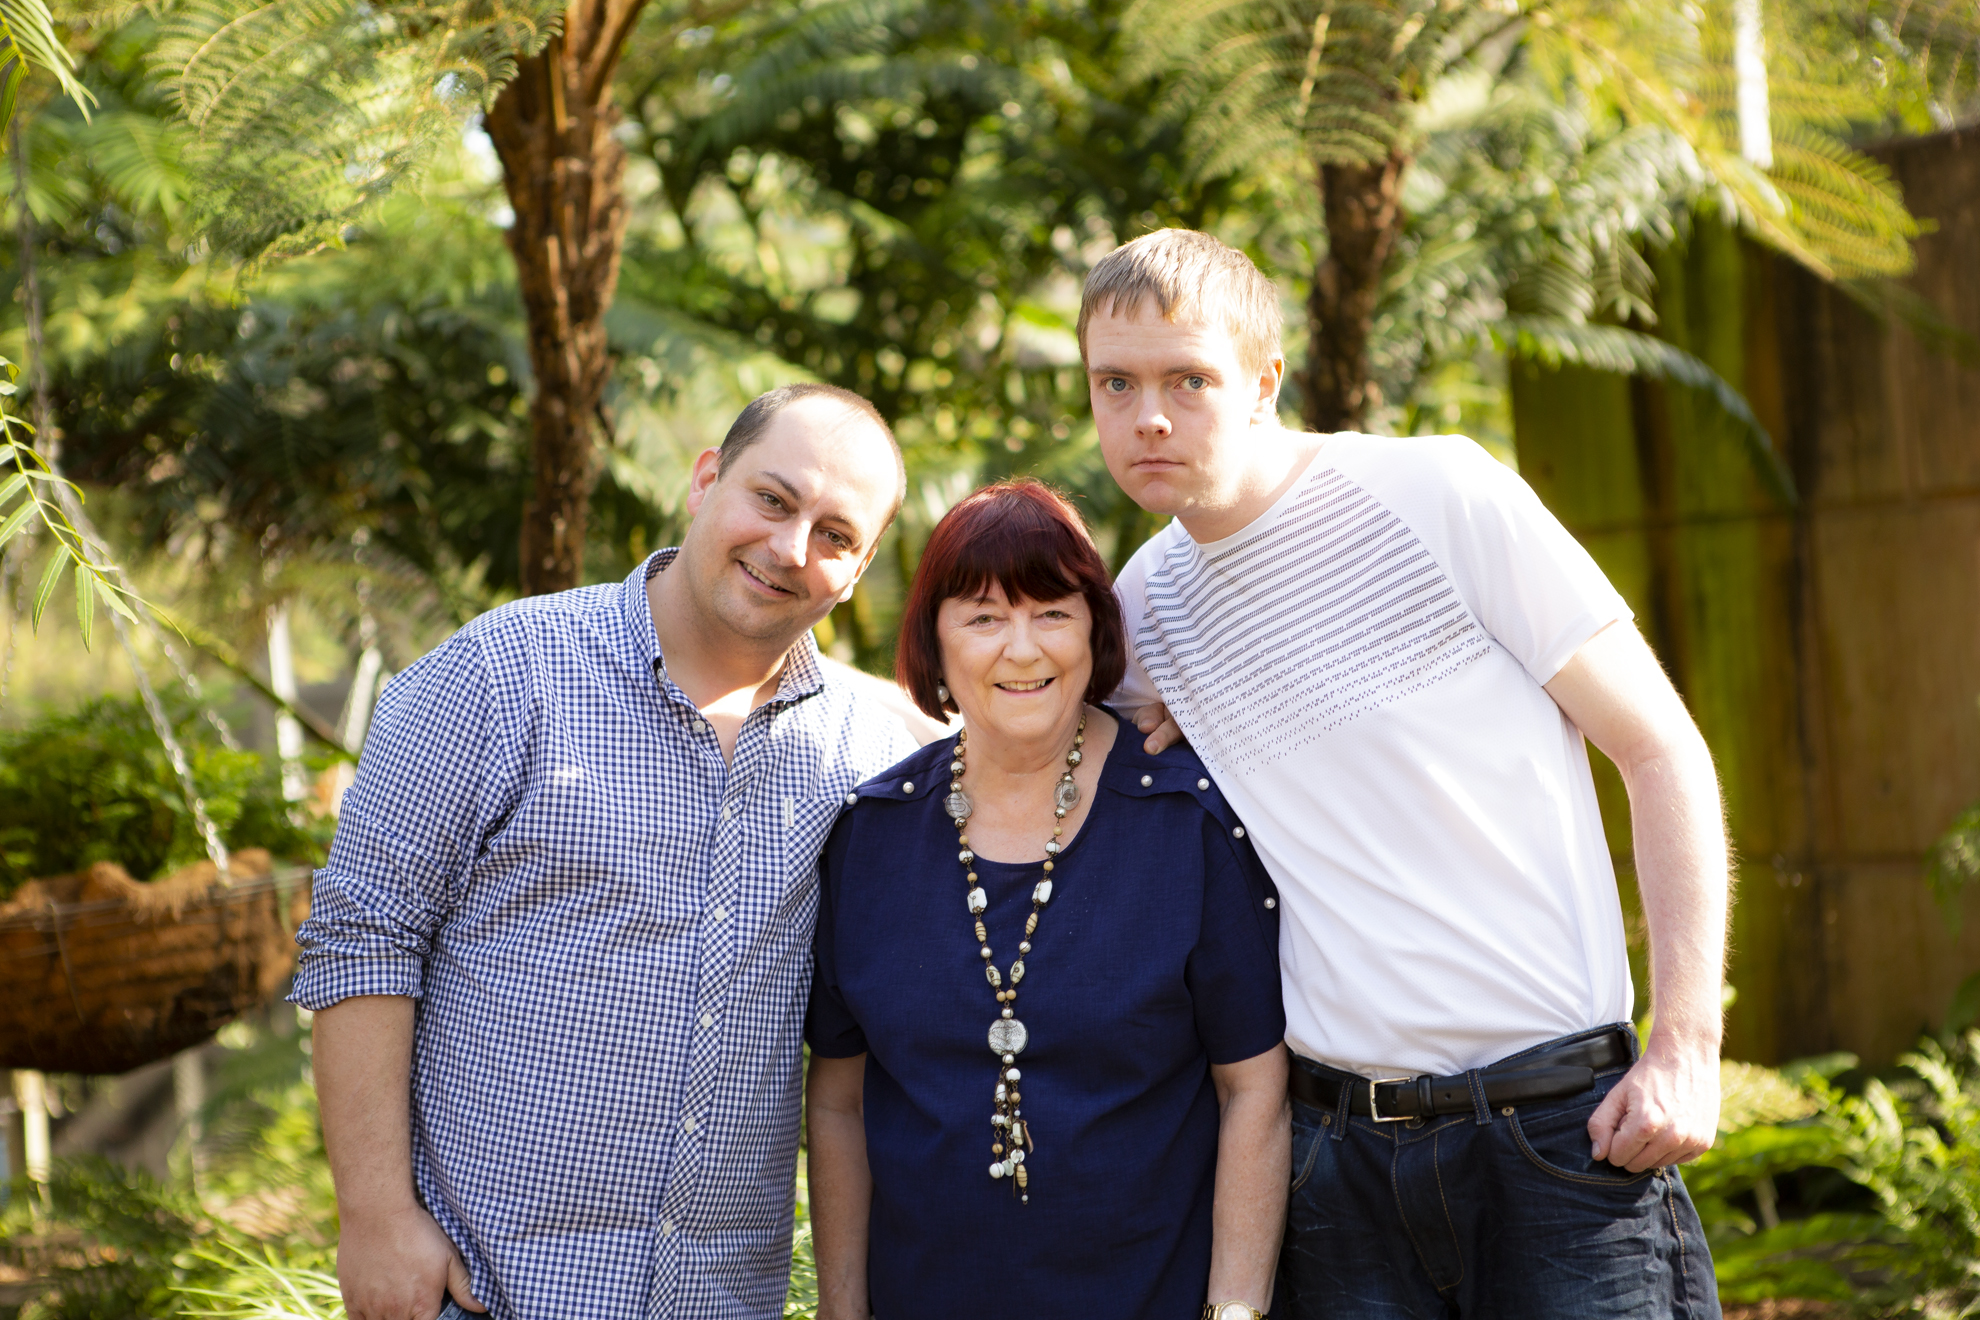 Classic Family Portrait